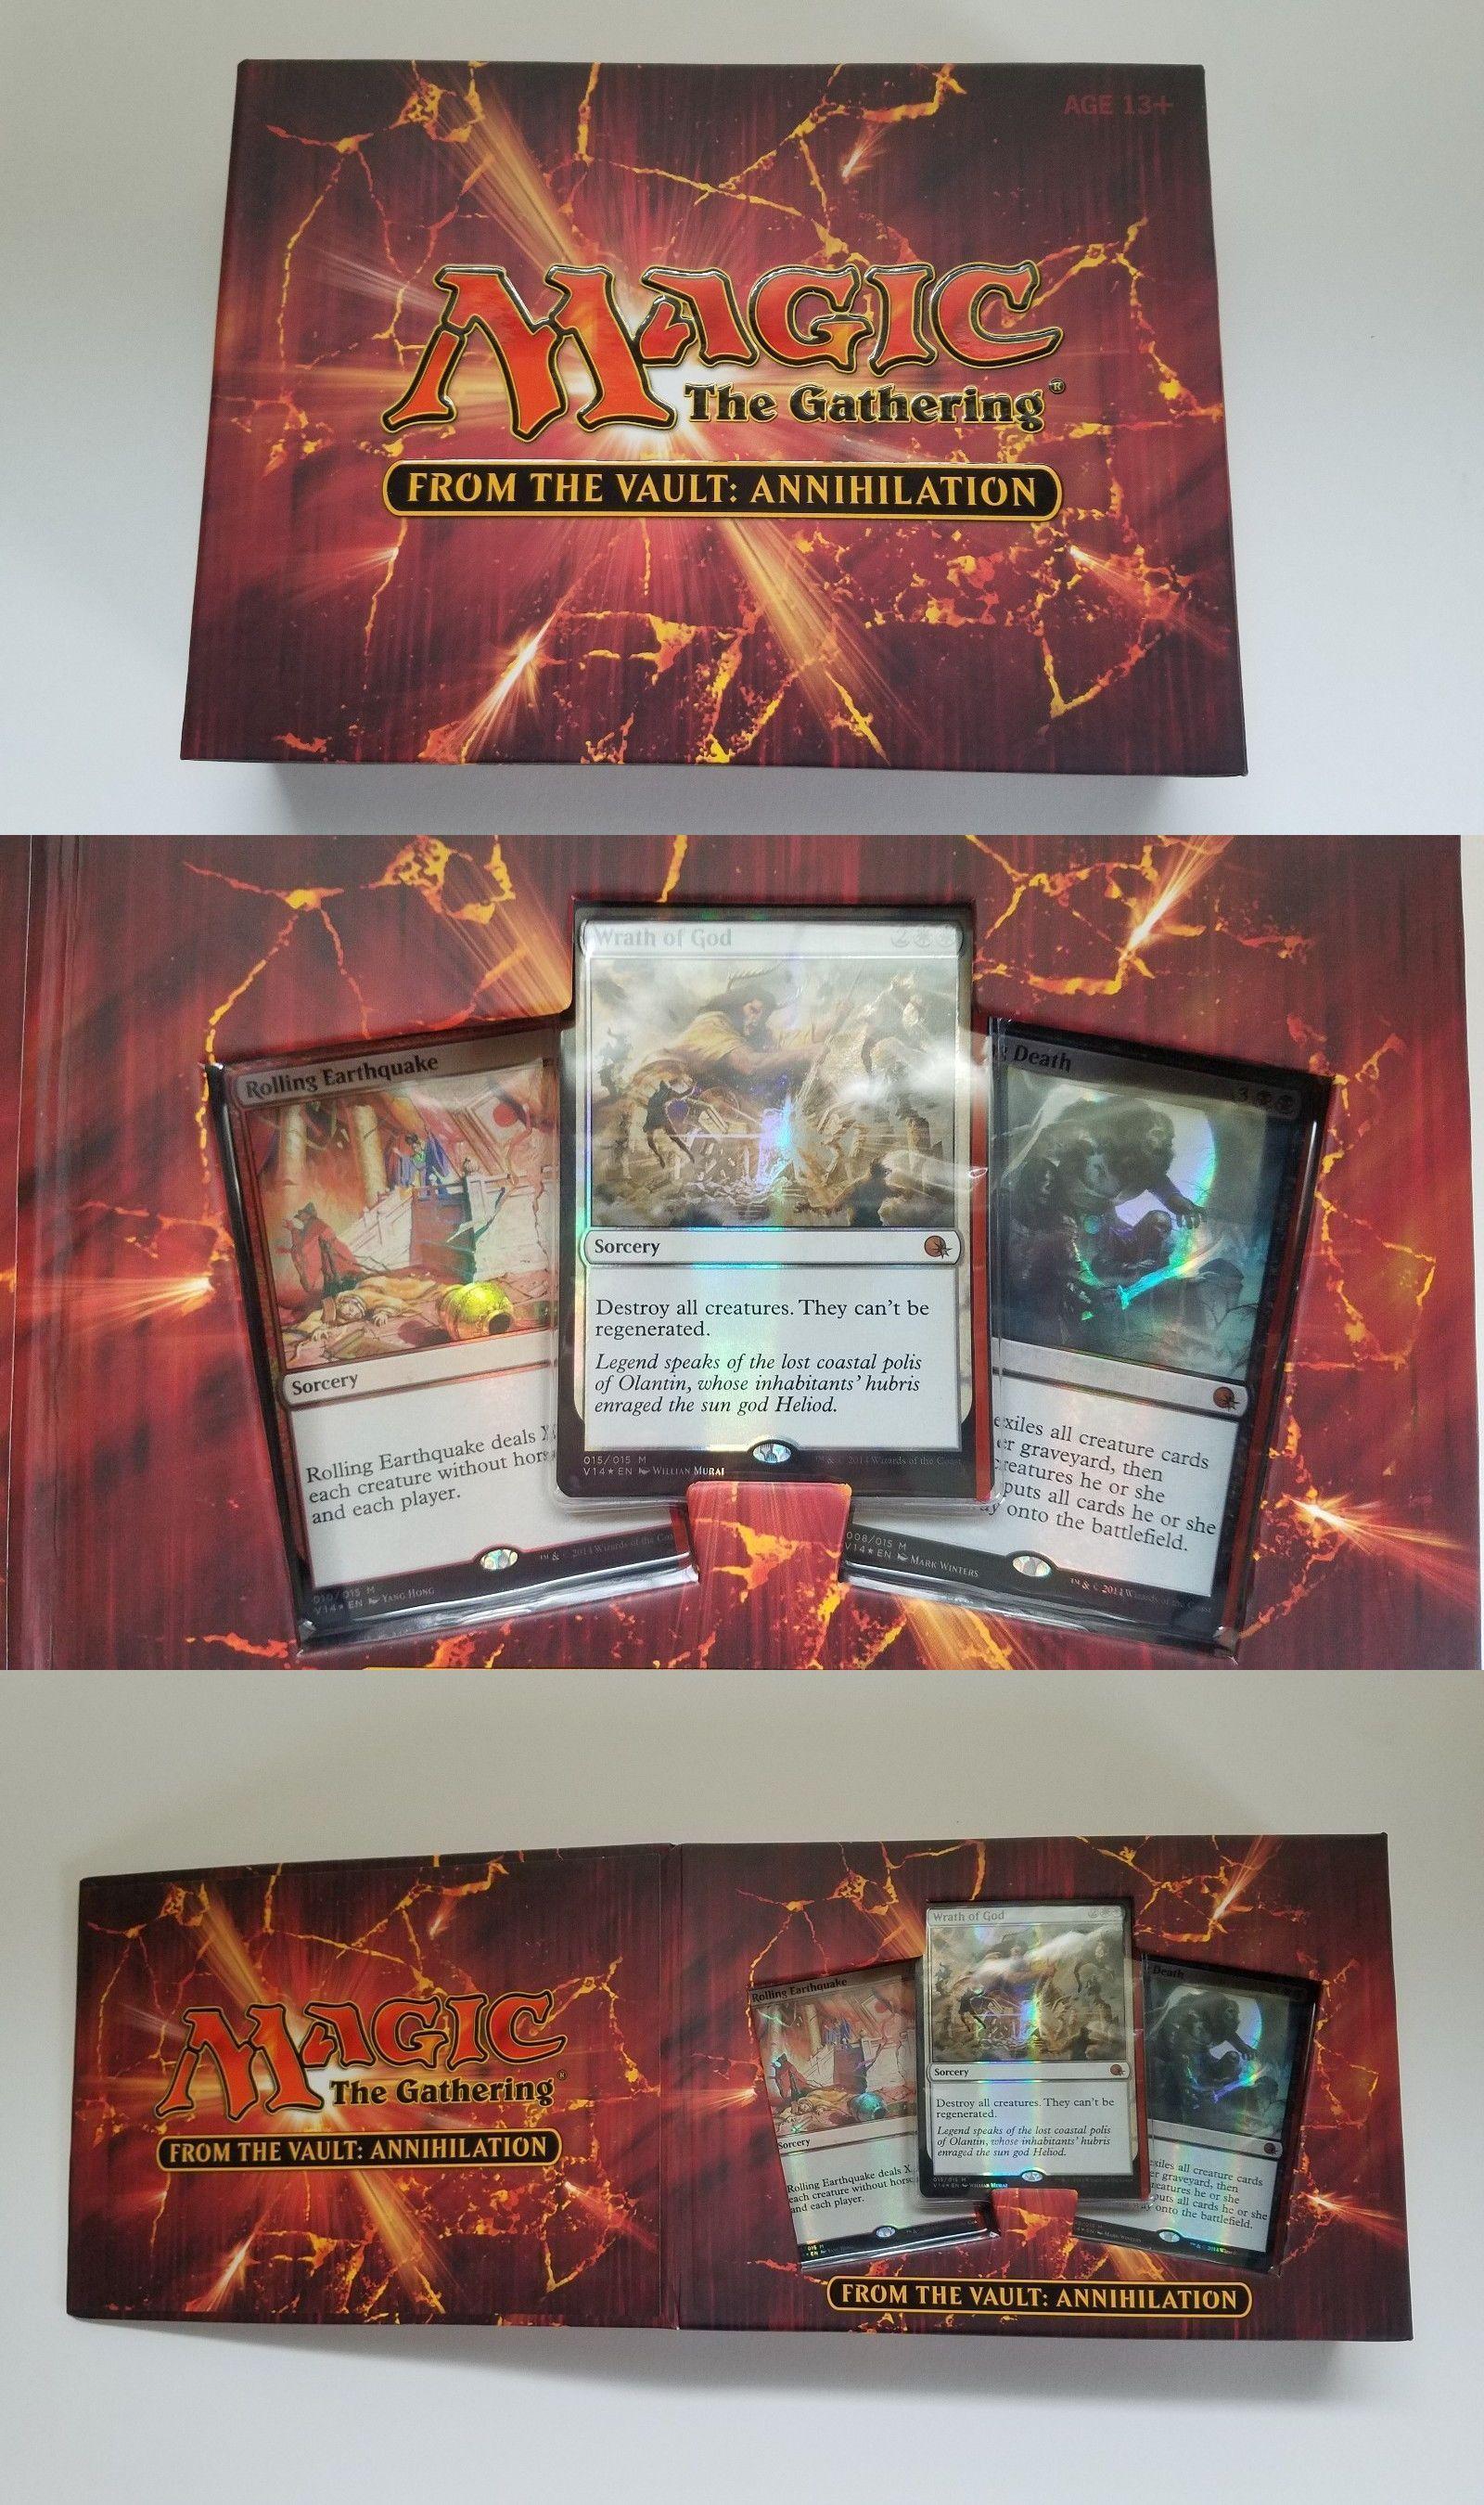 No Land Unstable COMPLETE Common Set X4 Pack Fresh Mint Magic Gathering MTG